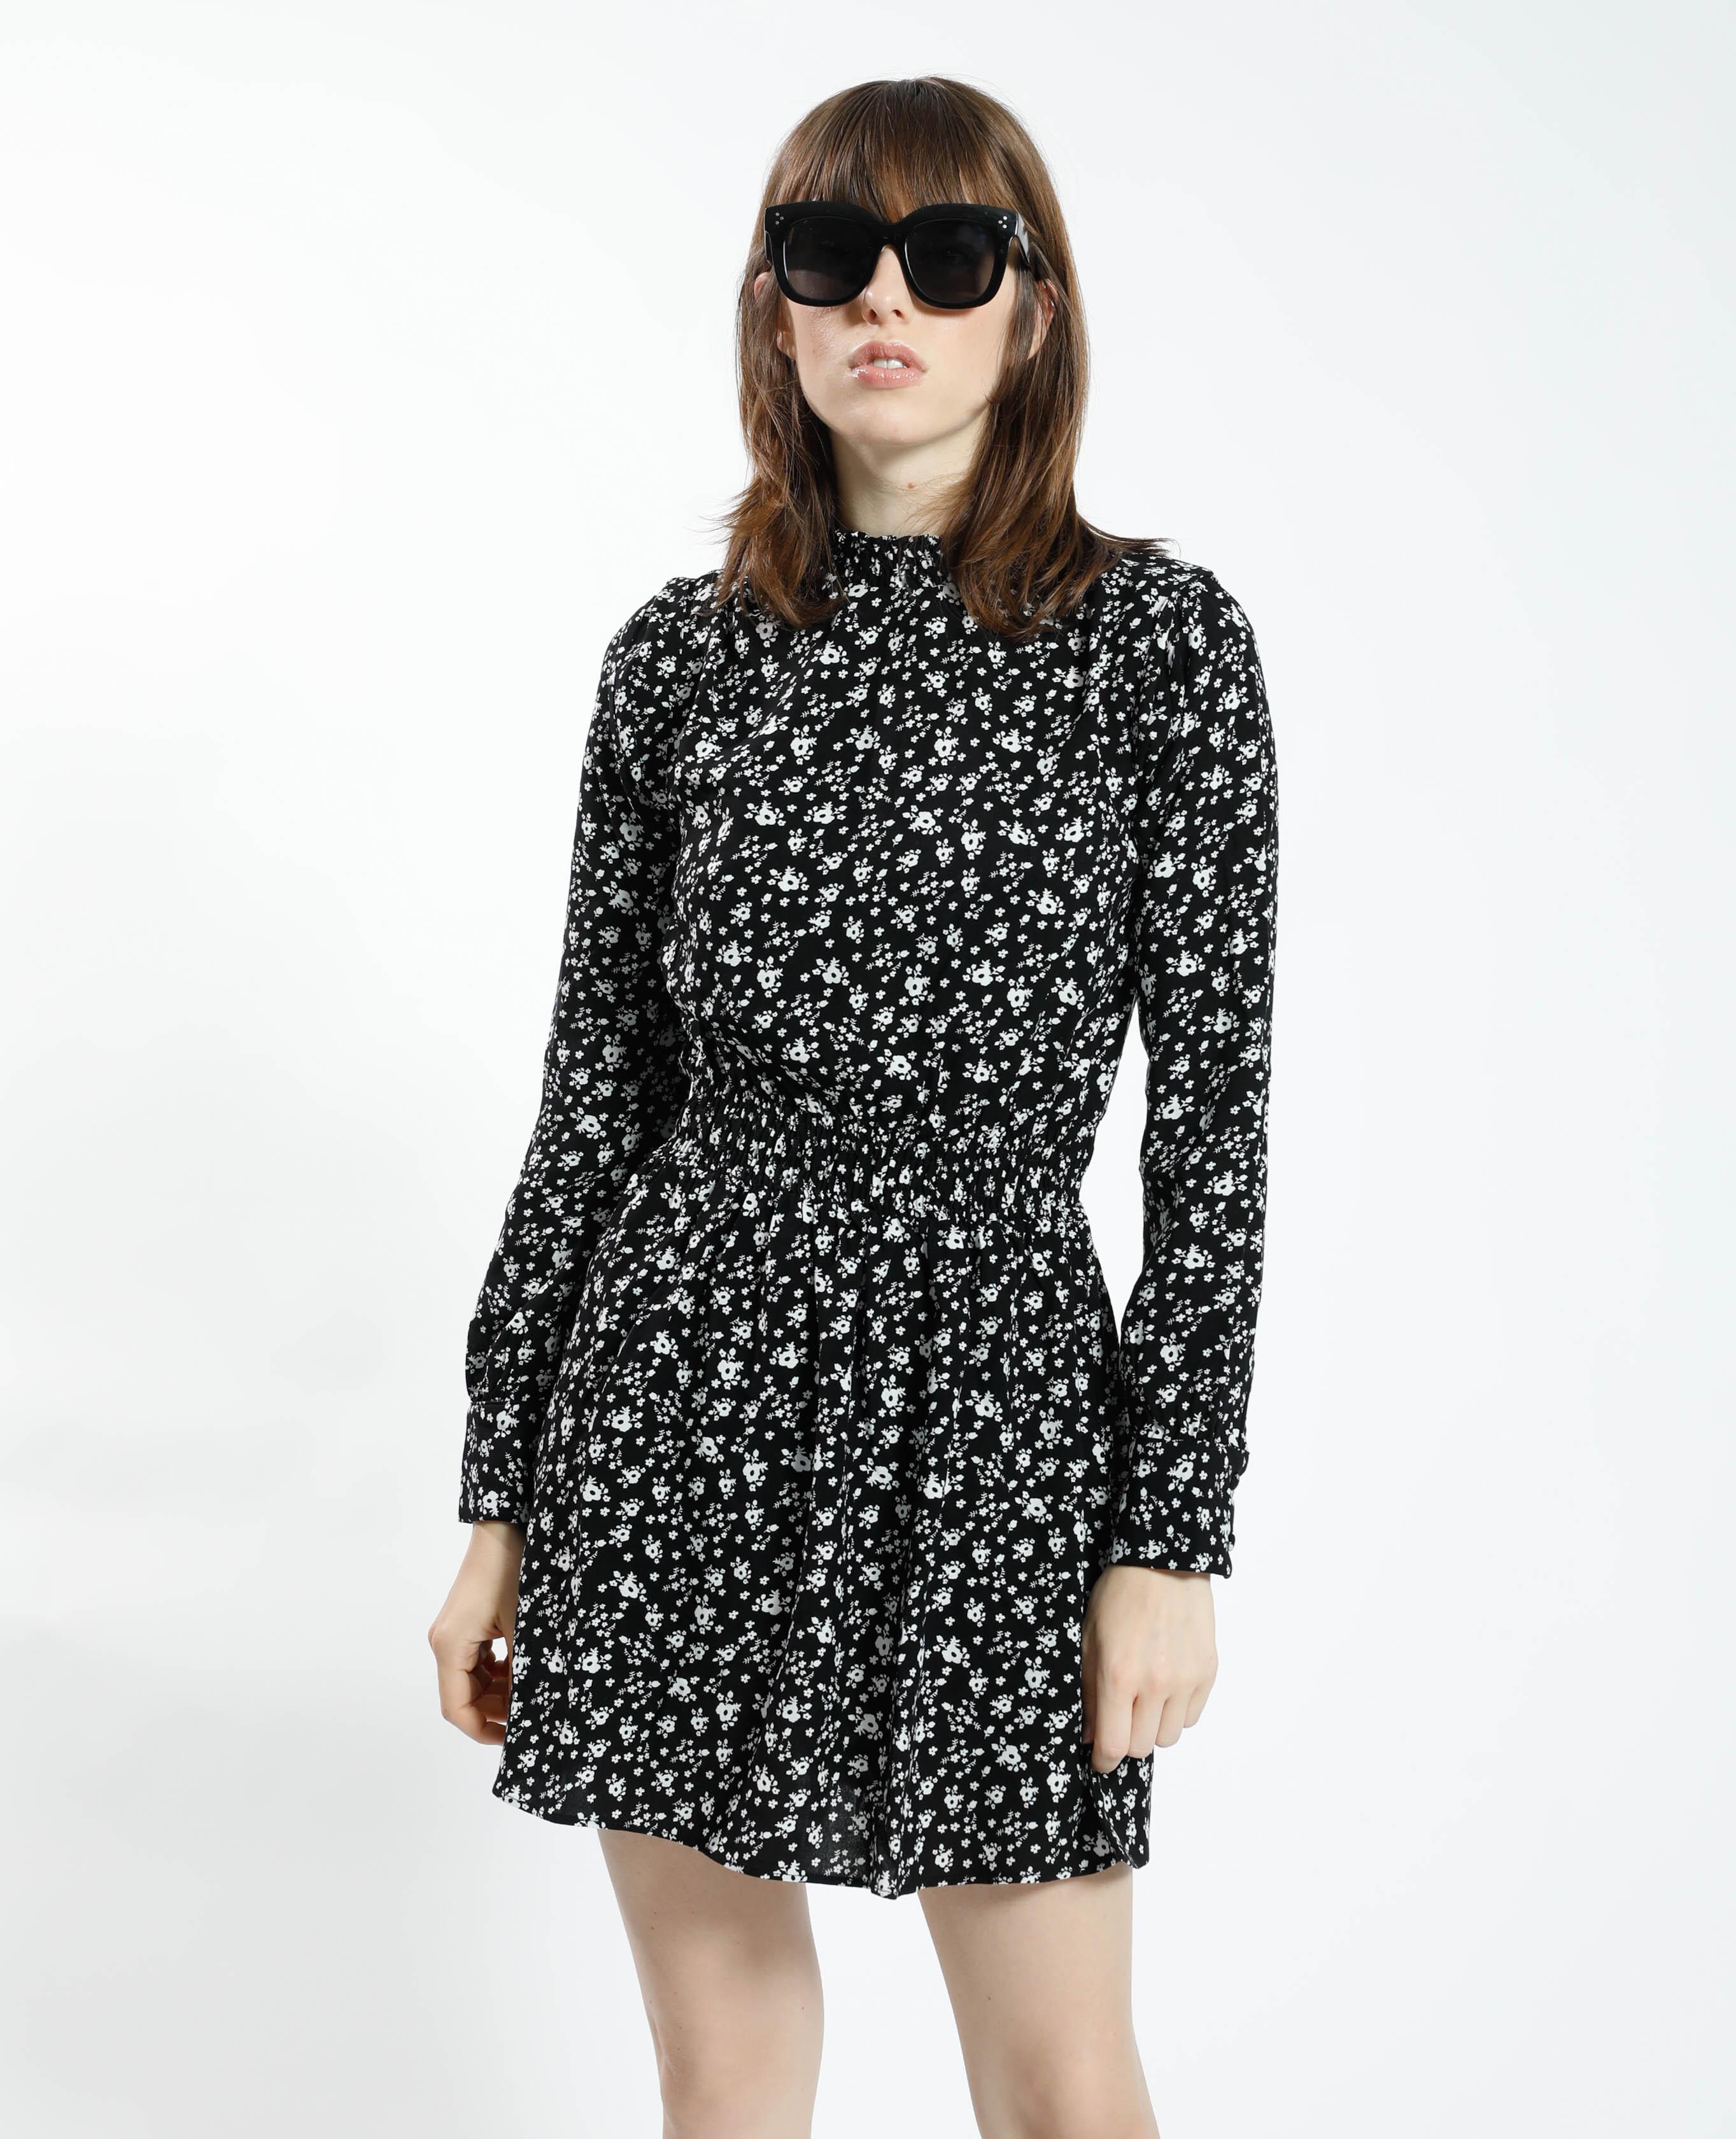 Robe courte fleurie noir - Pimkie